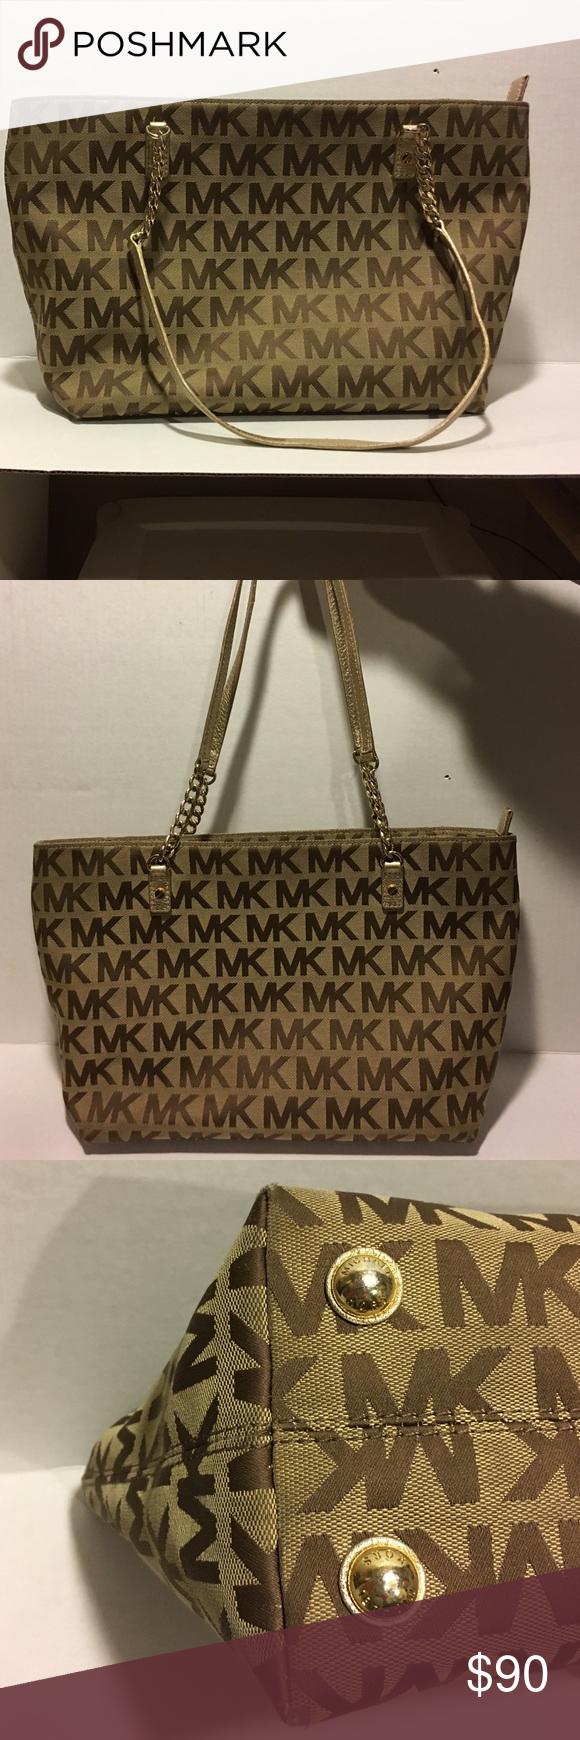 Michael Kors pocketbook- E-1307 Excellent condition- slight wear on bottom corners KORS Michael Kors Bags Totes